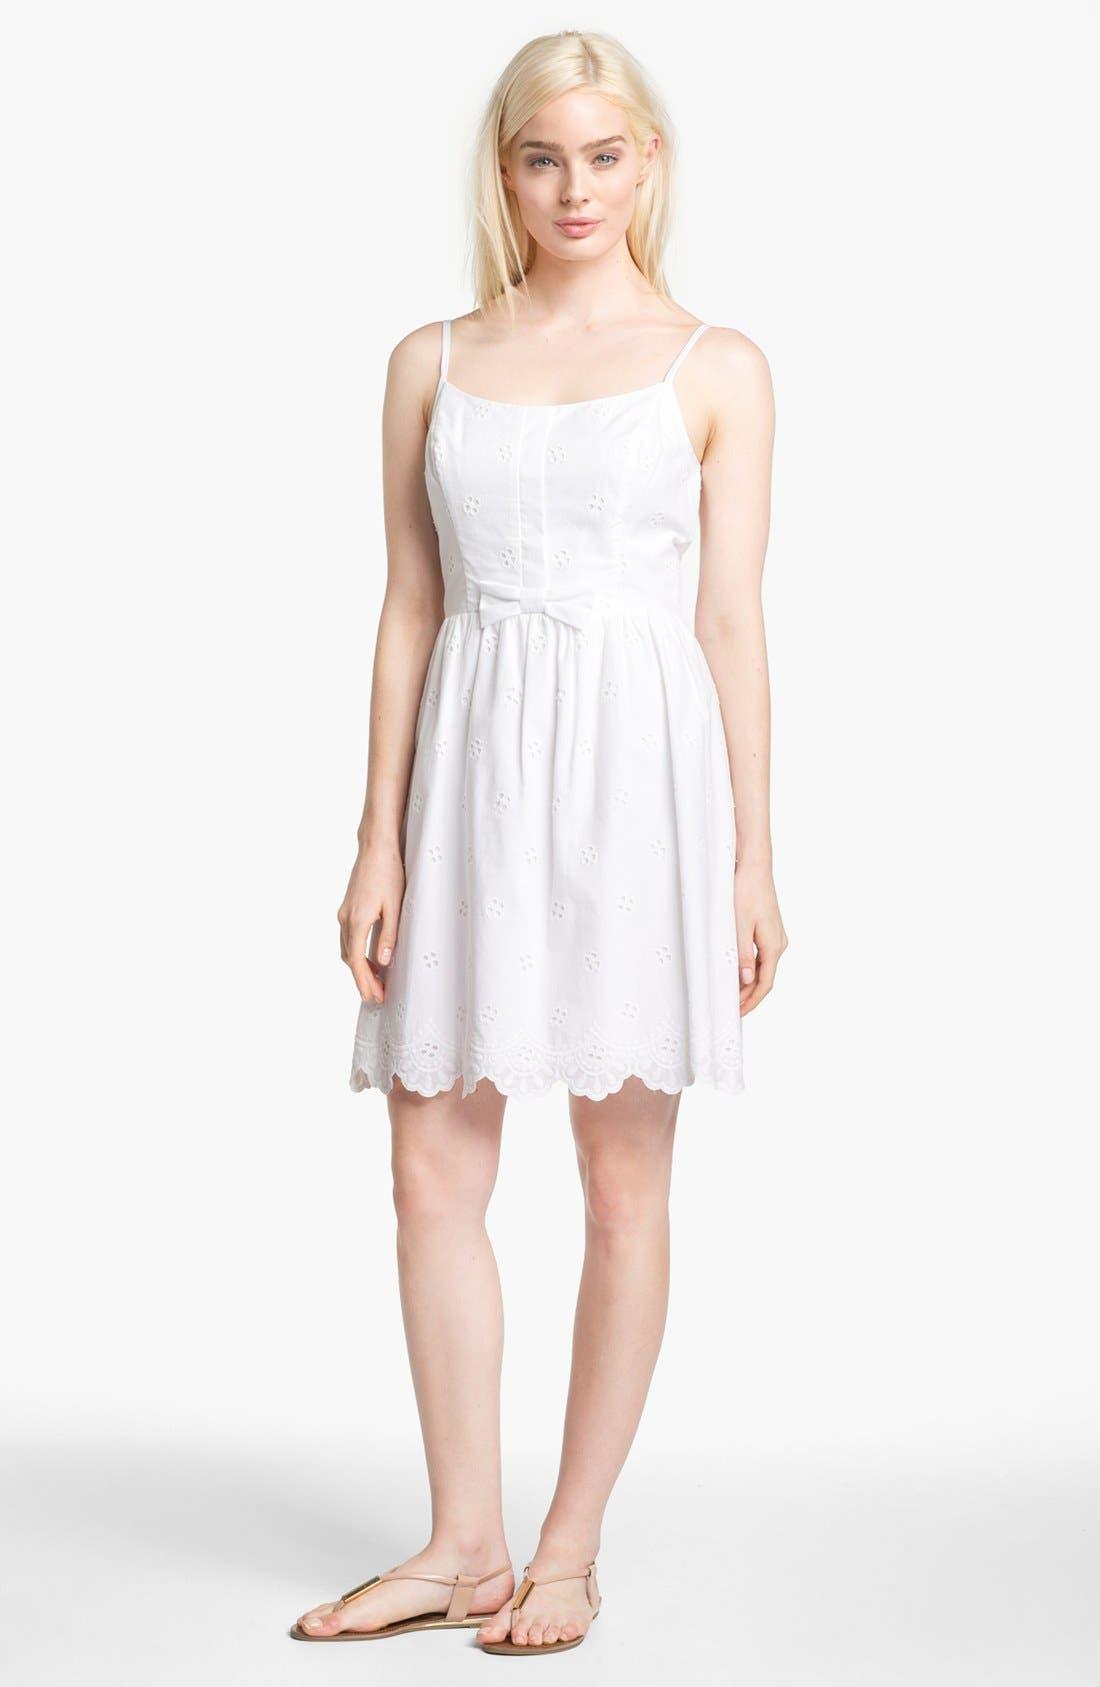 Alternate Image 1 Selected - Lilly Pulitzer® 'Antonia' Cotton Eyelet Dress